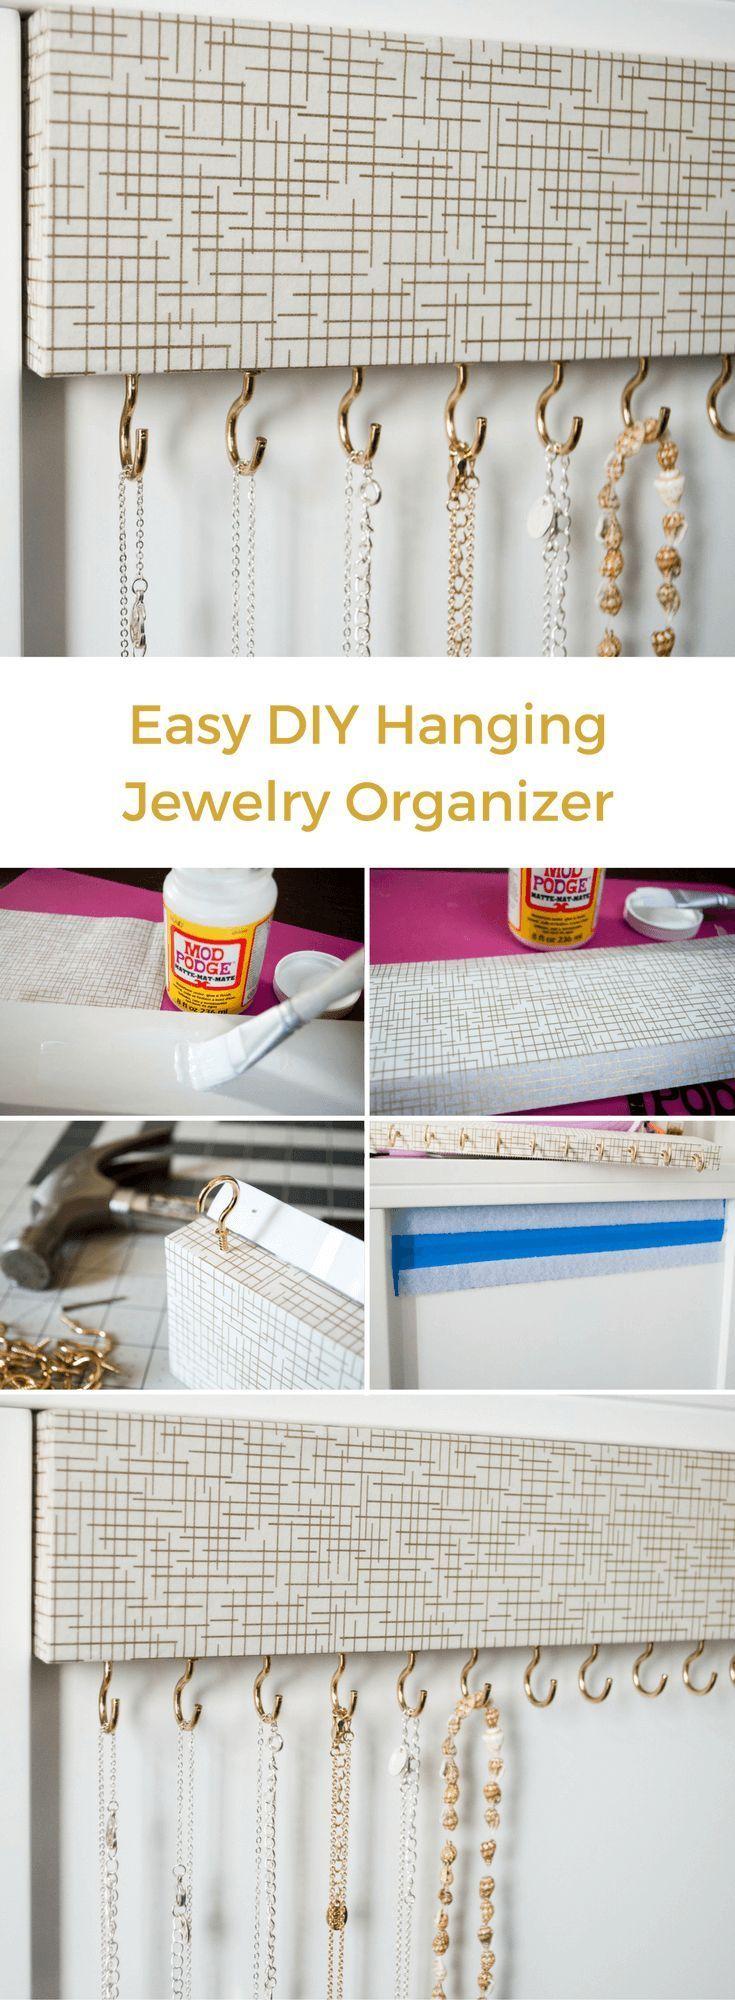 Easy DIY Jewelry Organizer for TangleFree Necklaces Jewelry